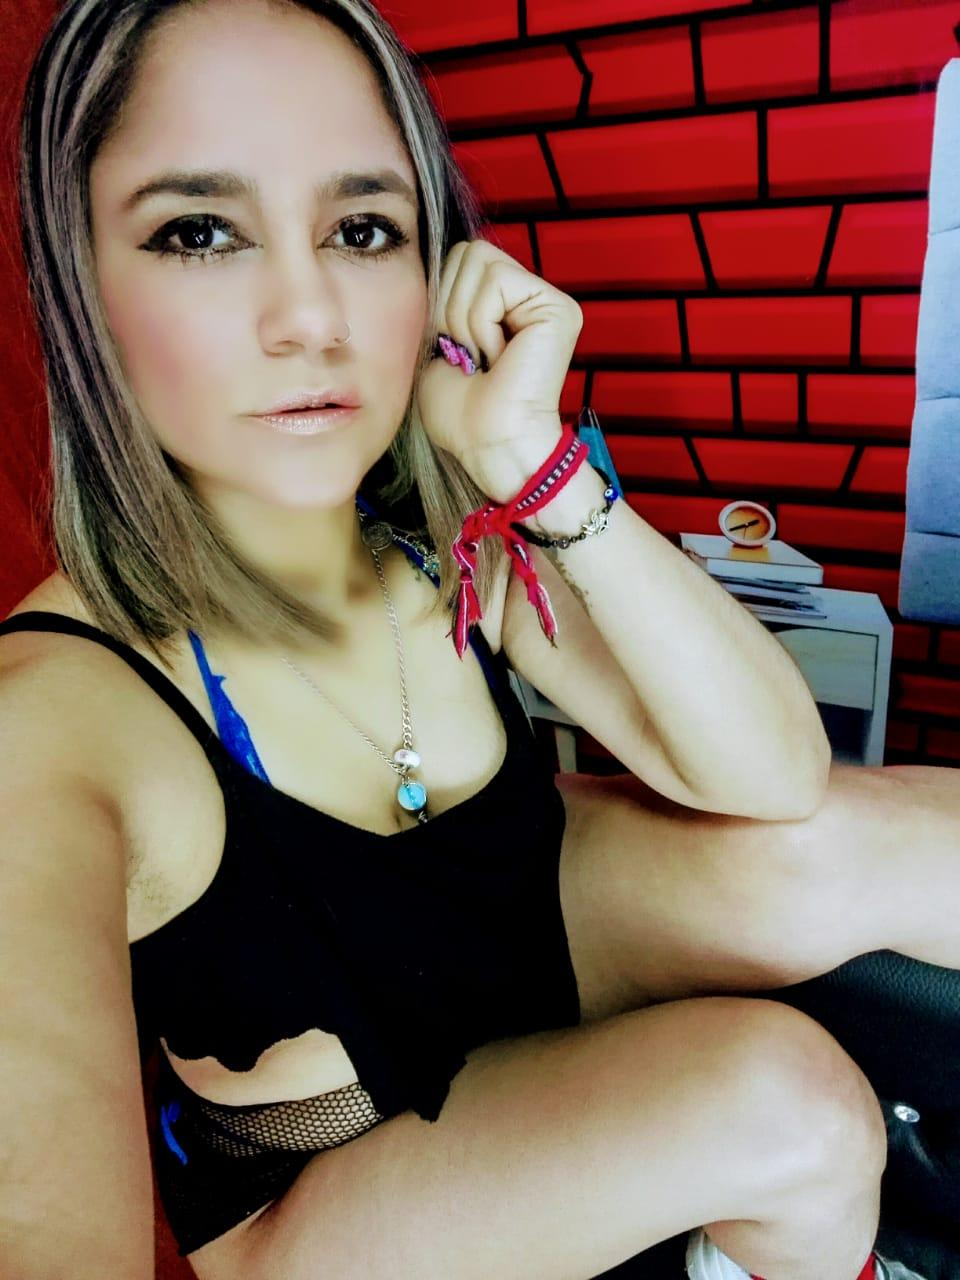 Camila rivero?s=4yn7xh0vvn0znkctfaoisjjdlr0xelmelobcpqnn4jg=